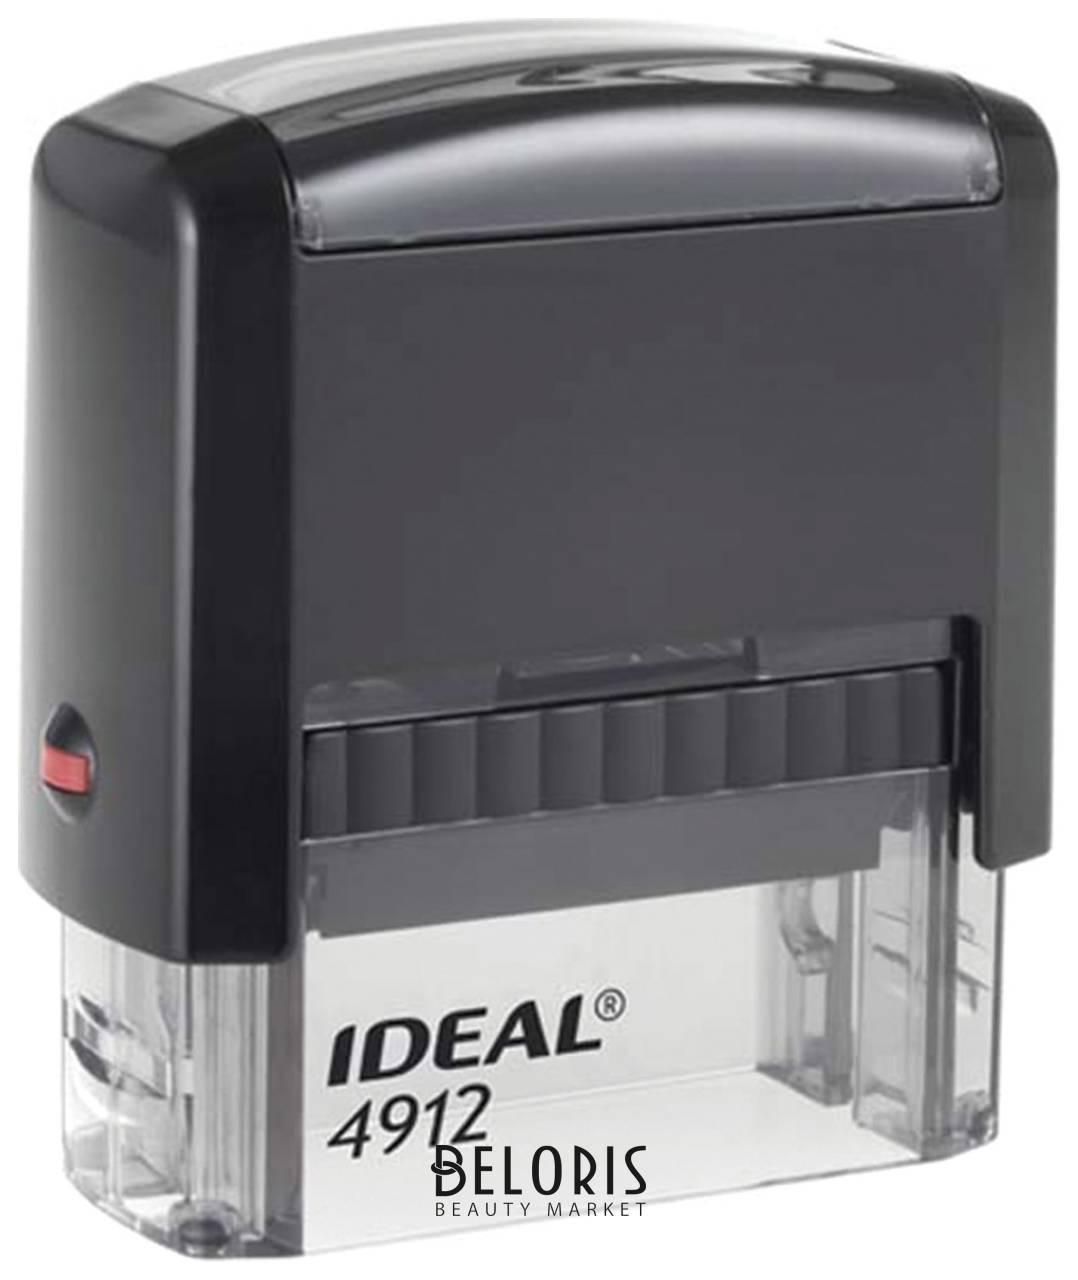 Оснастка для штампа, размер оттиска 47х18 мм, синий, Trodat Ideal 4912 P2, подушка в комплекте Trodat